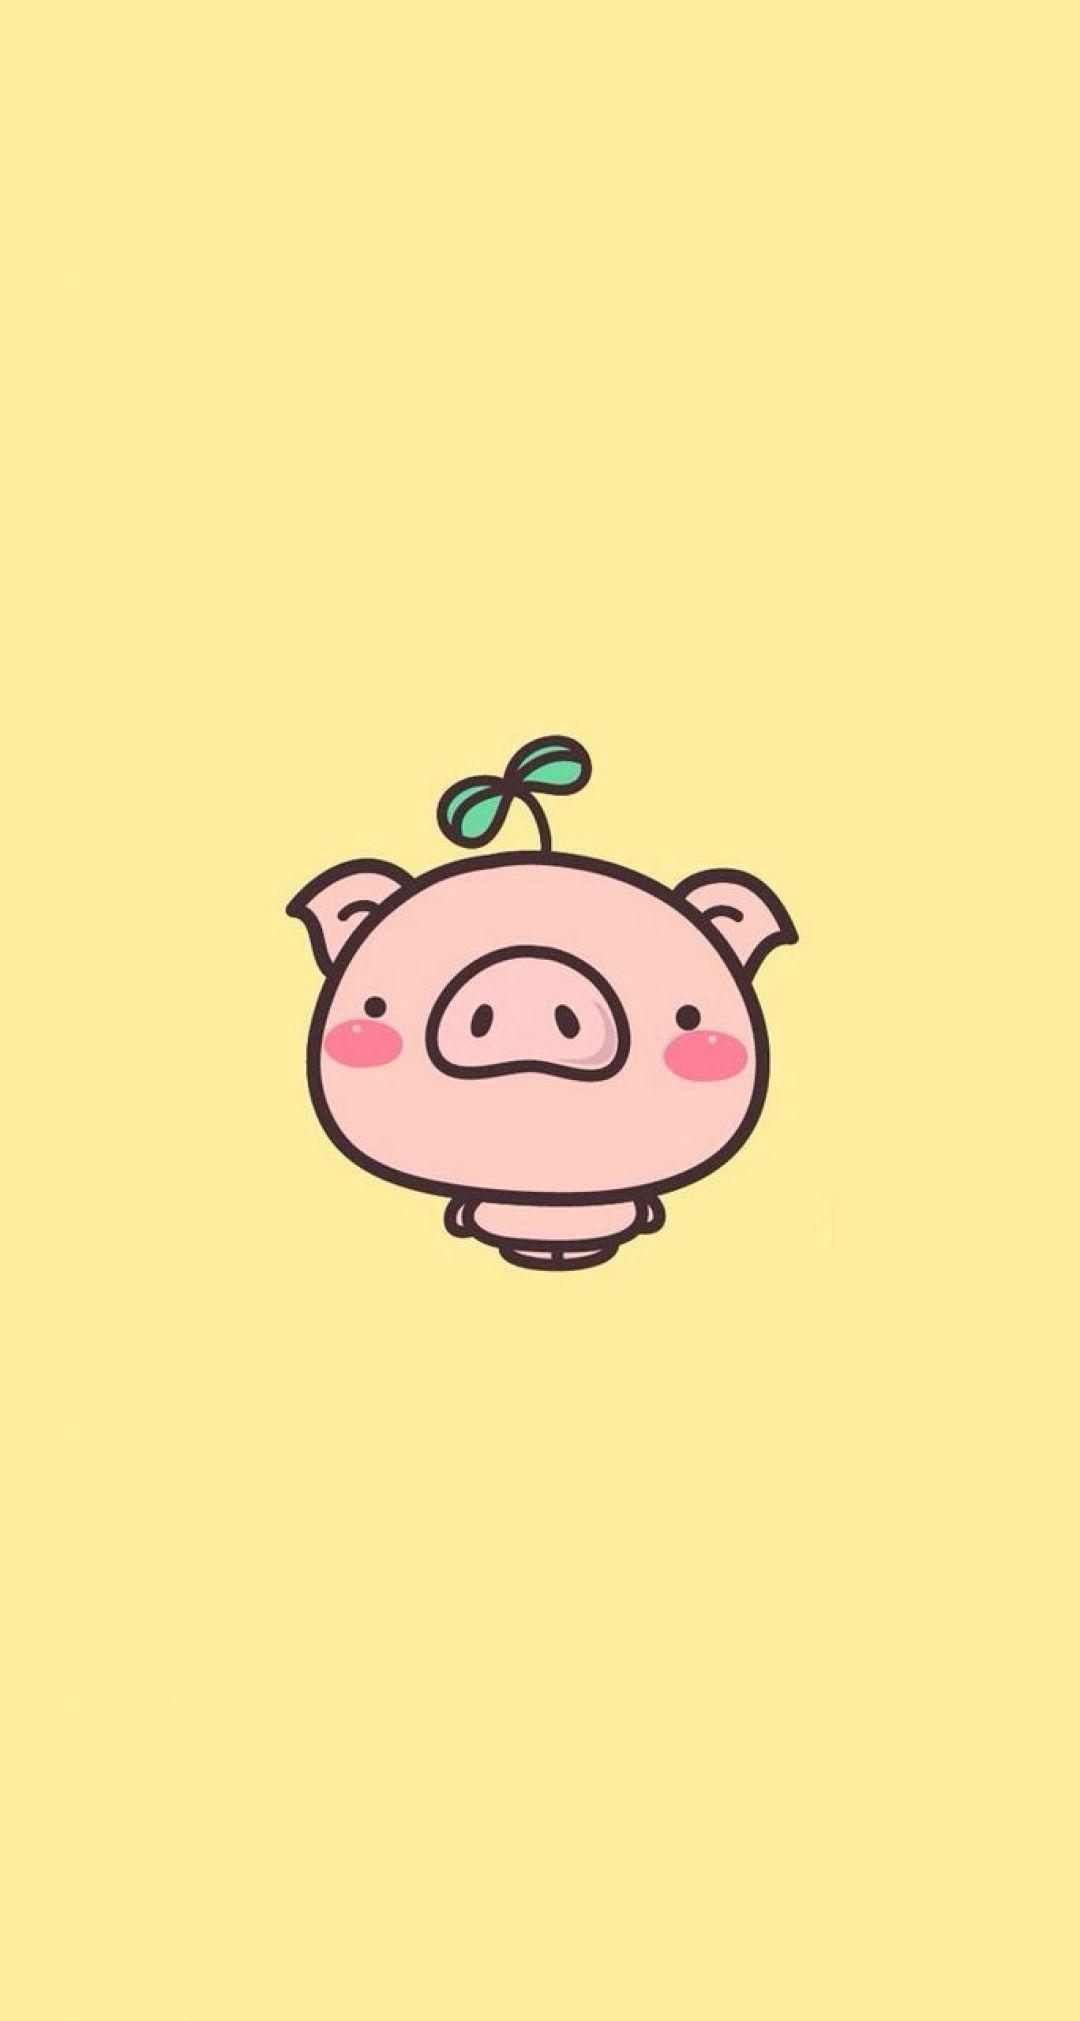 Pig Android Iphone Desktop Hd Backgrounds Wallpapers 1080p 4k 126363 Hdwallpapers Androidwallpapers Ip Pig Wallpaper Cartoon Wallpaper Cute Pigs Cool kawaii cute pig wallpaper hd images